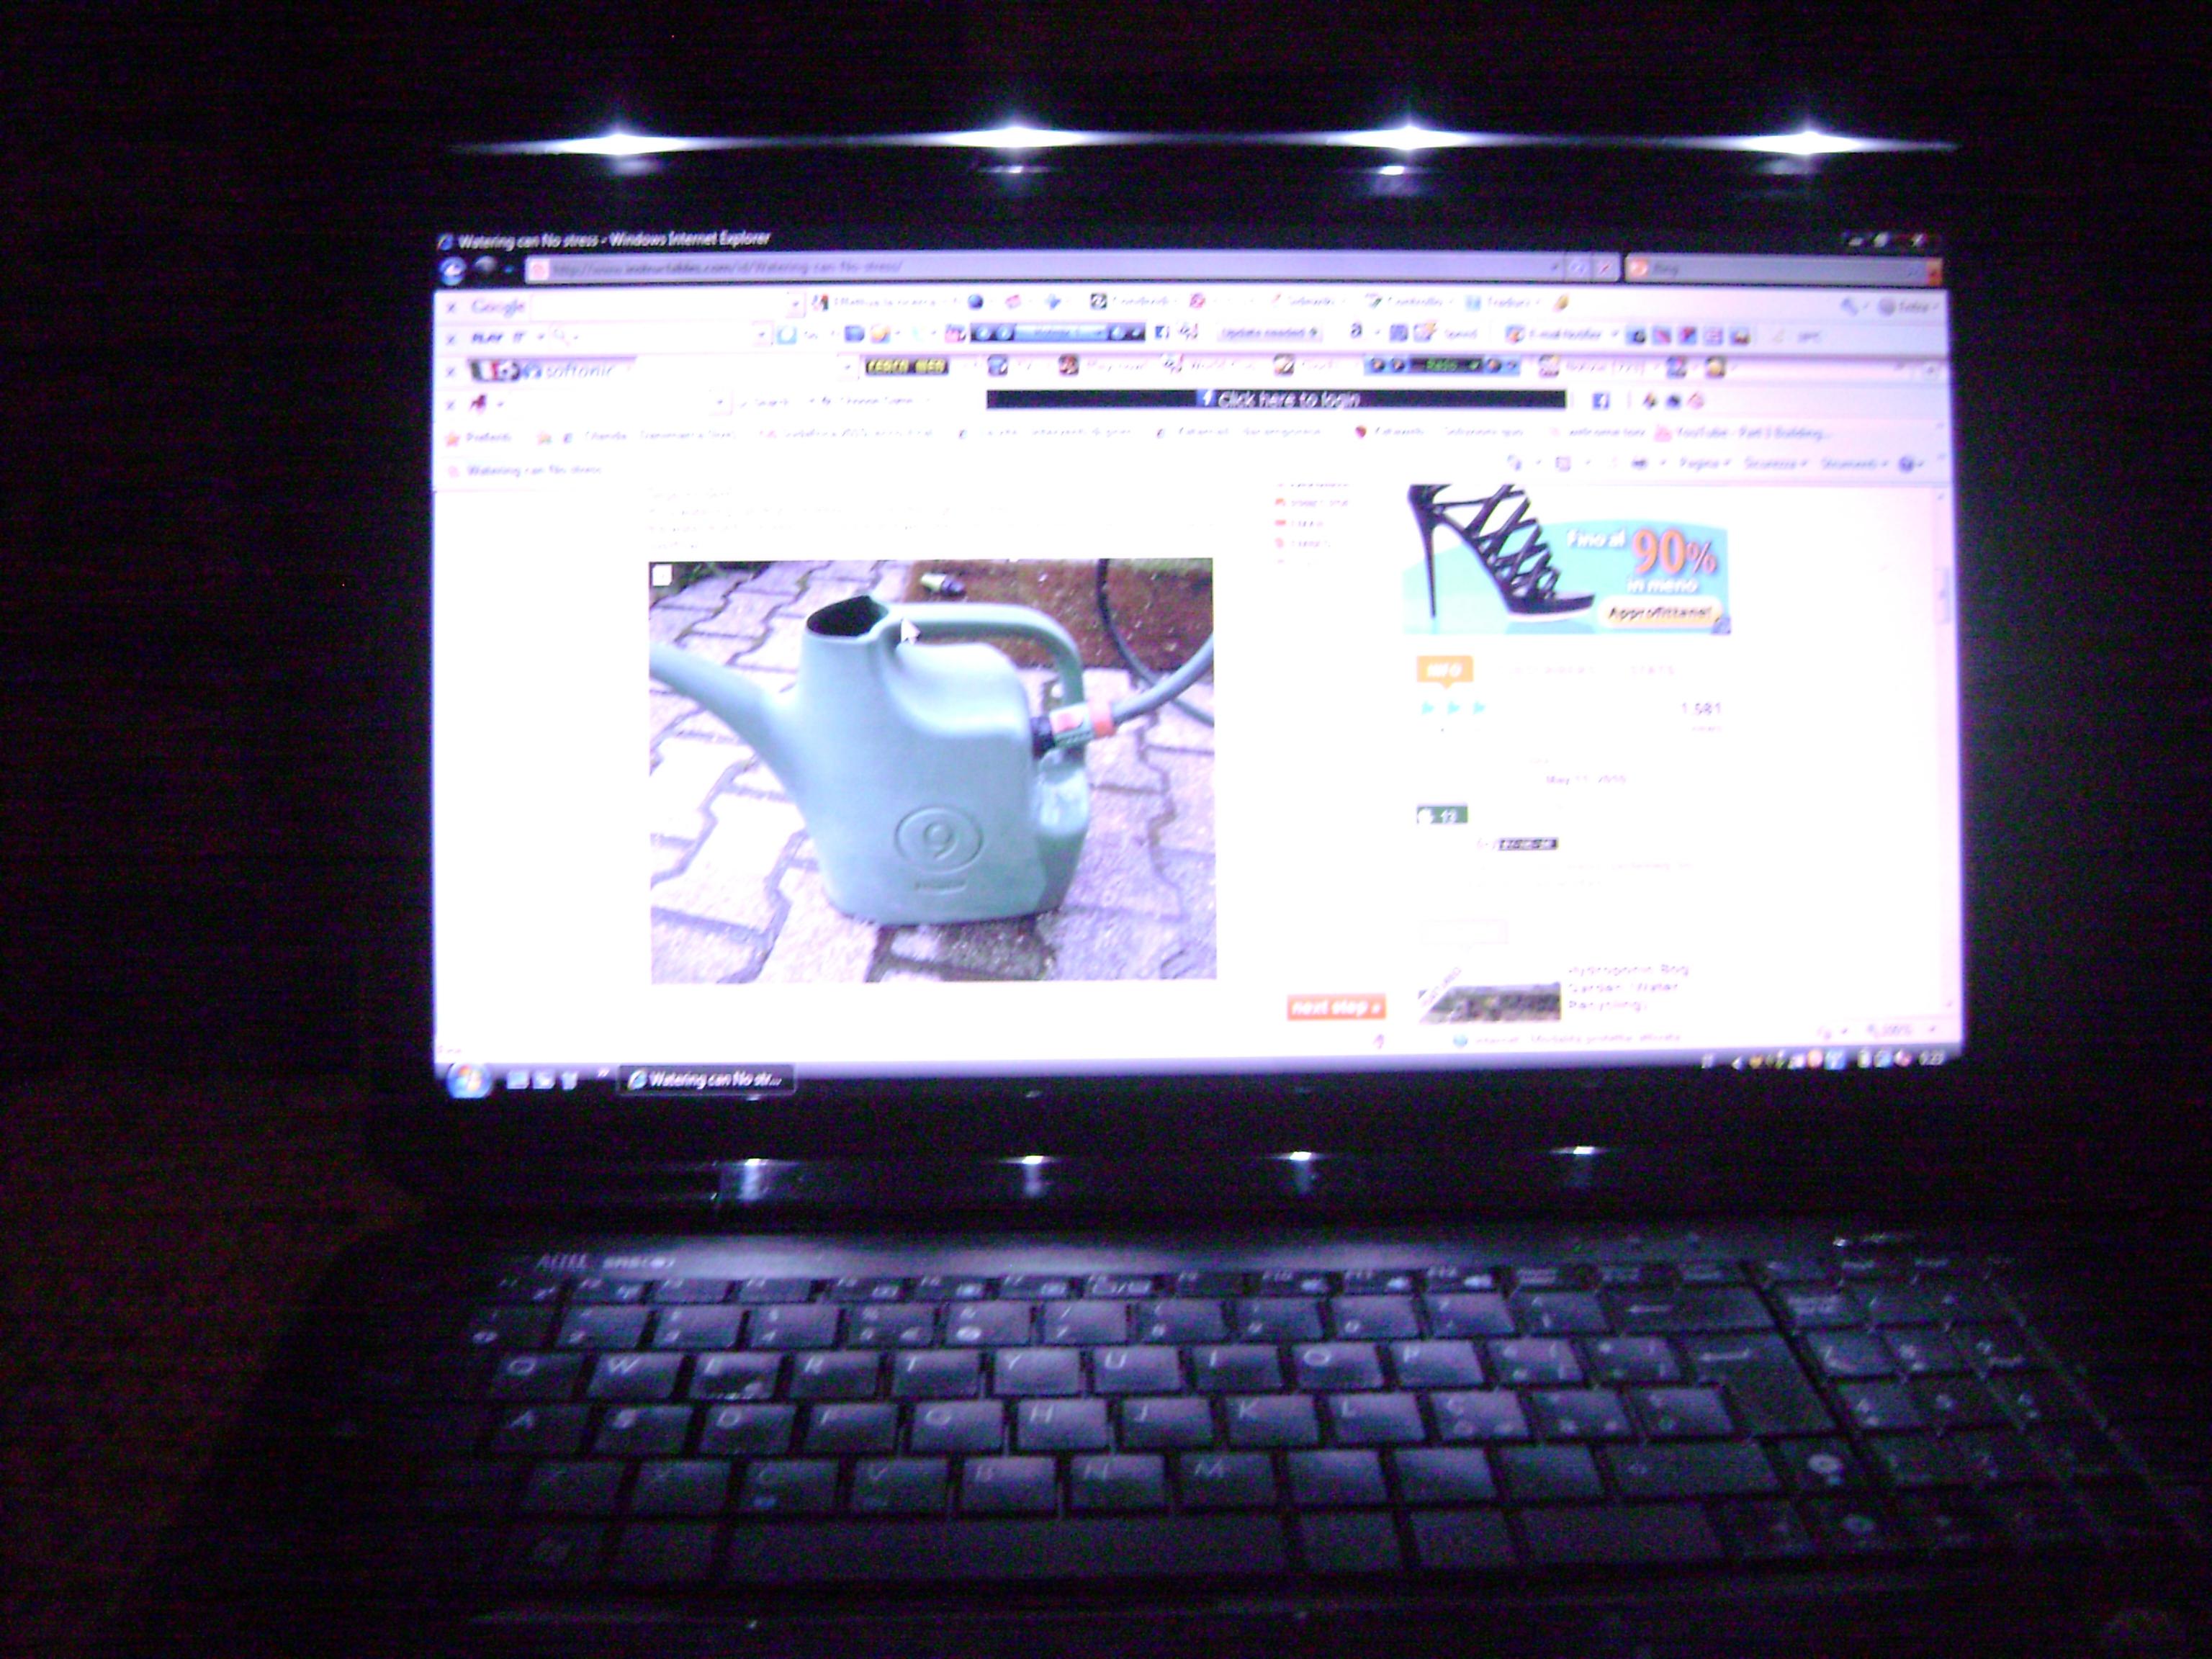 Nightlight led laptop from USB